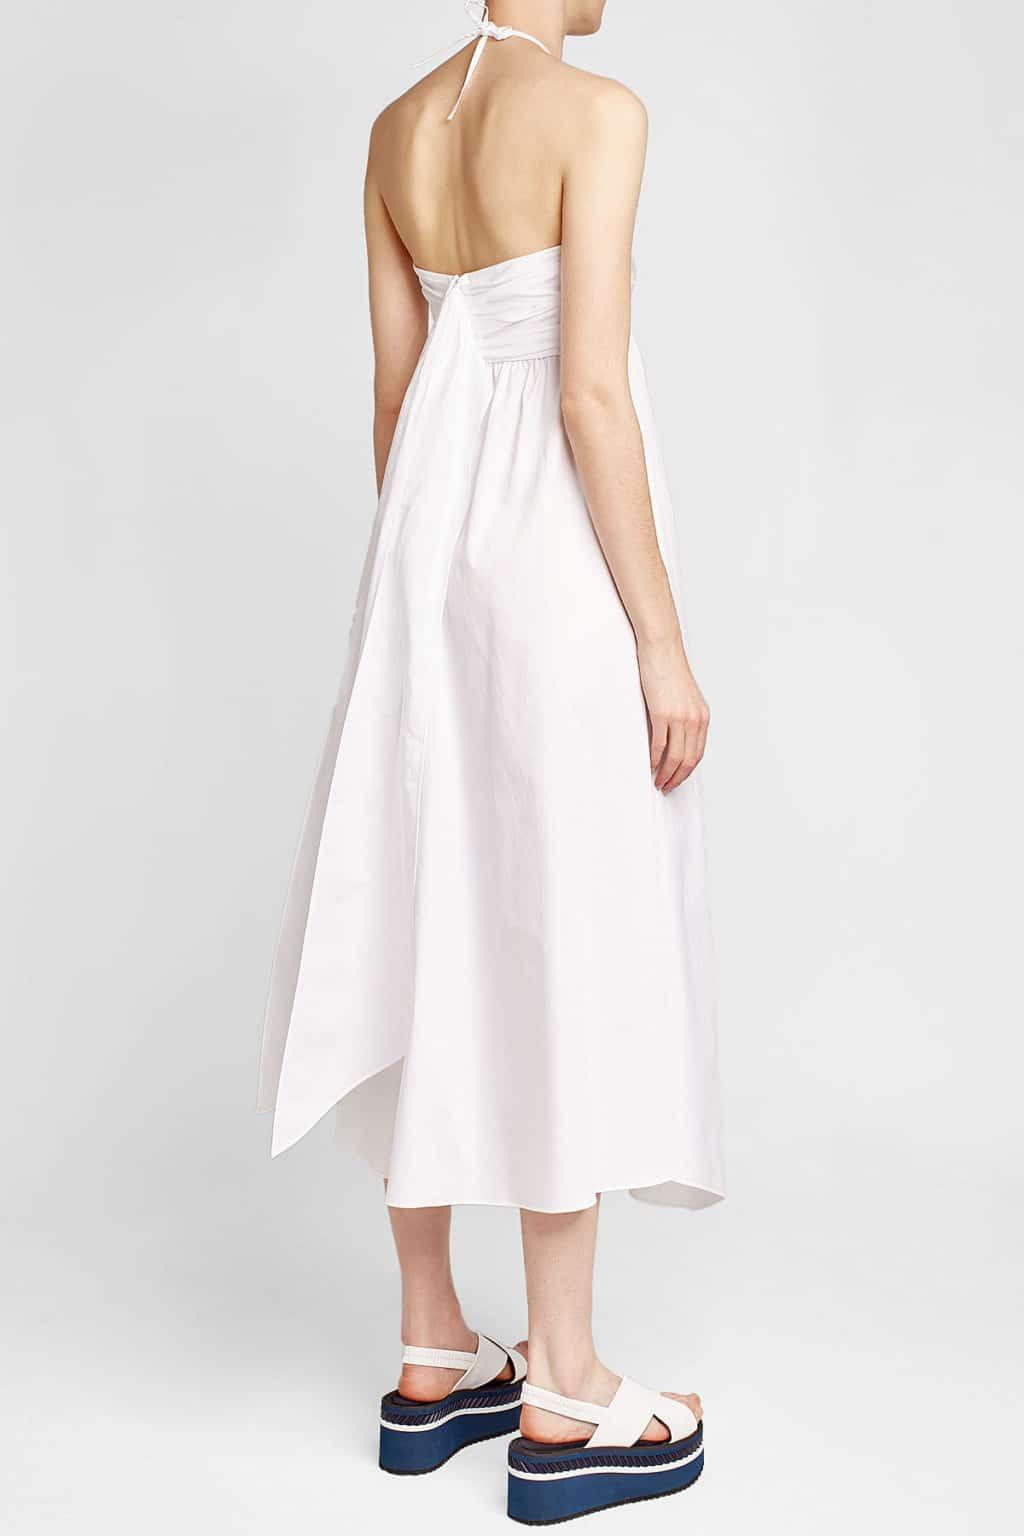 Jil Sander Navy Cotton Halter White Dress